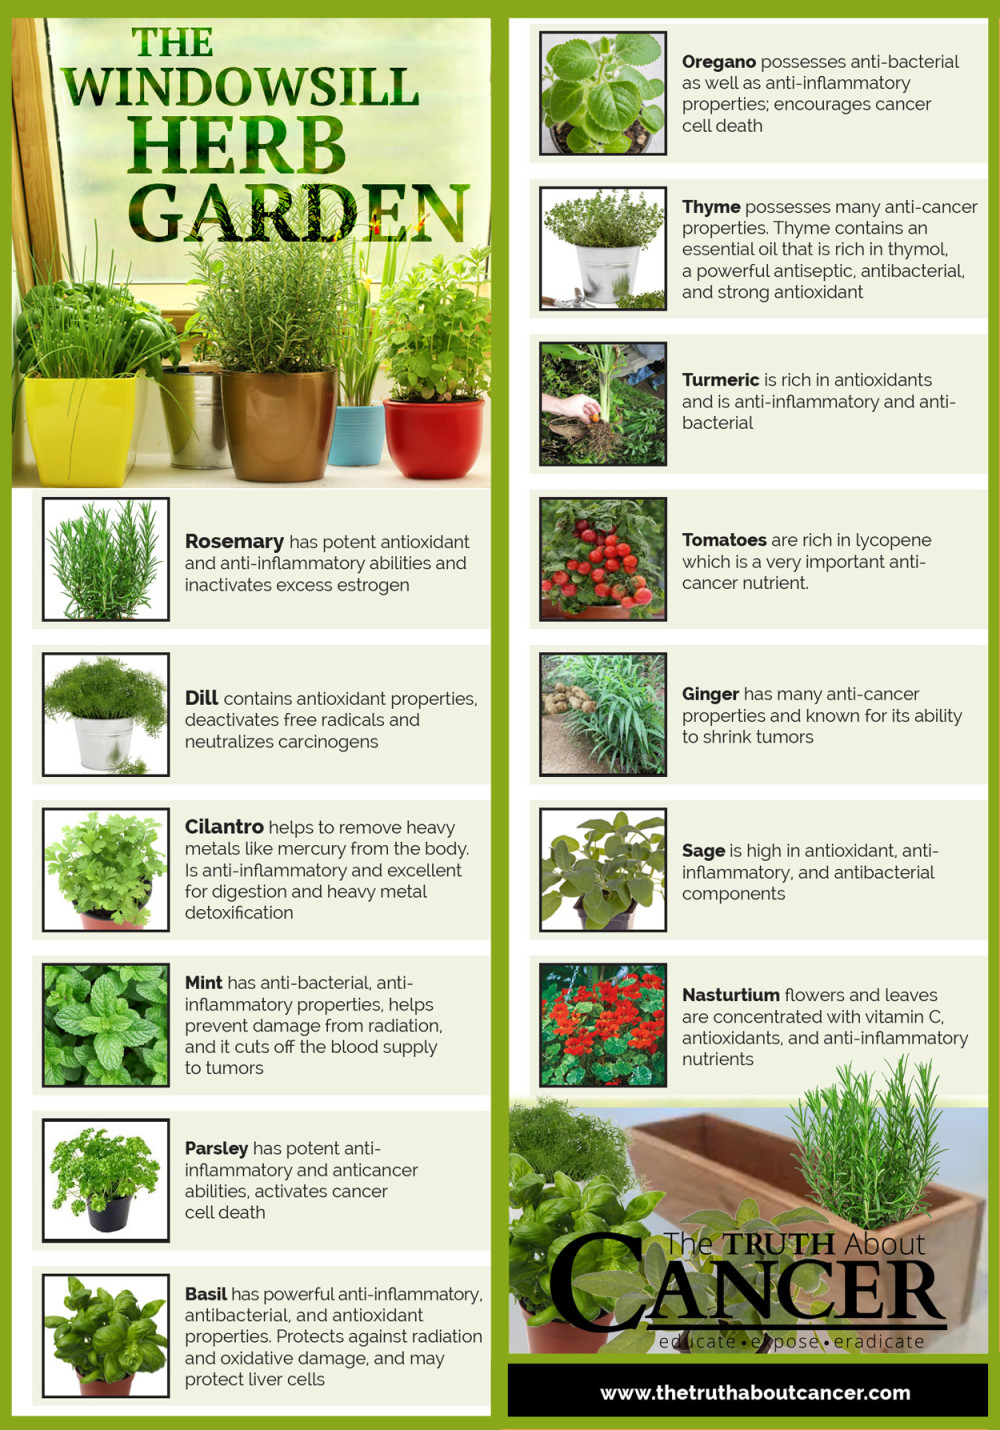 Charmant Windowshill Herb Garden Article